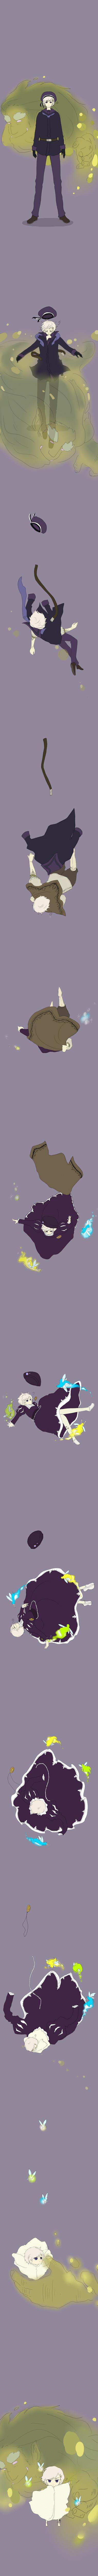 Tags: Anime, Sira, Axis Powers: Hetalia, Norway, Troll, Age Progression, Fanart, Nordic Countries